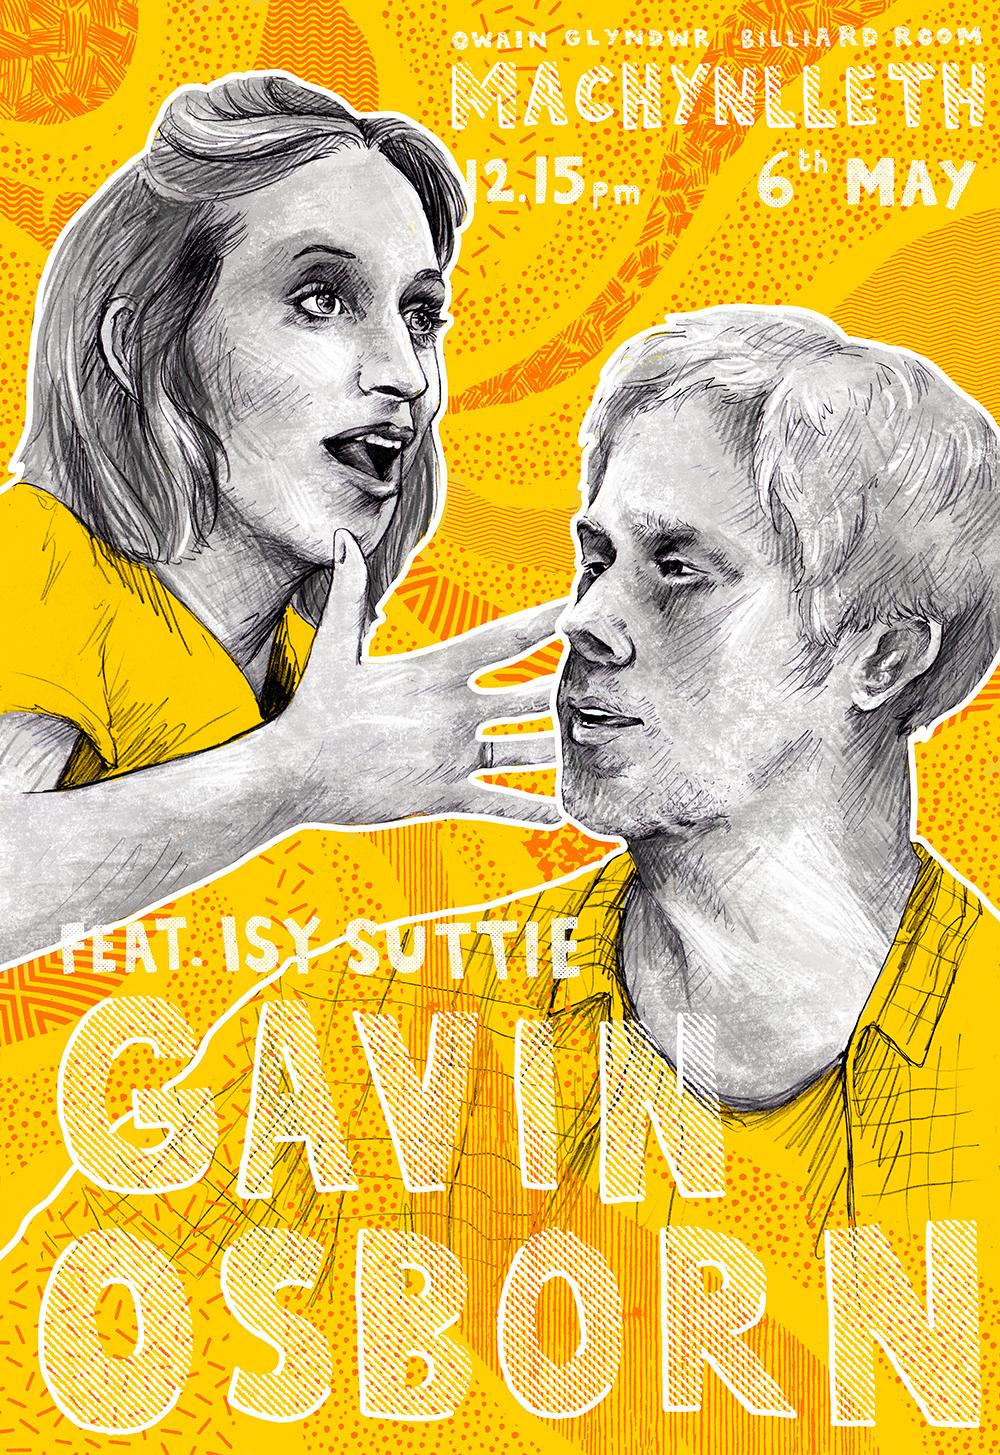 GavinIsyPosterweb.jpg